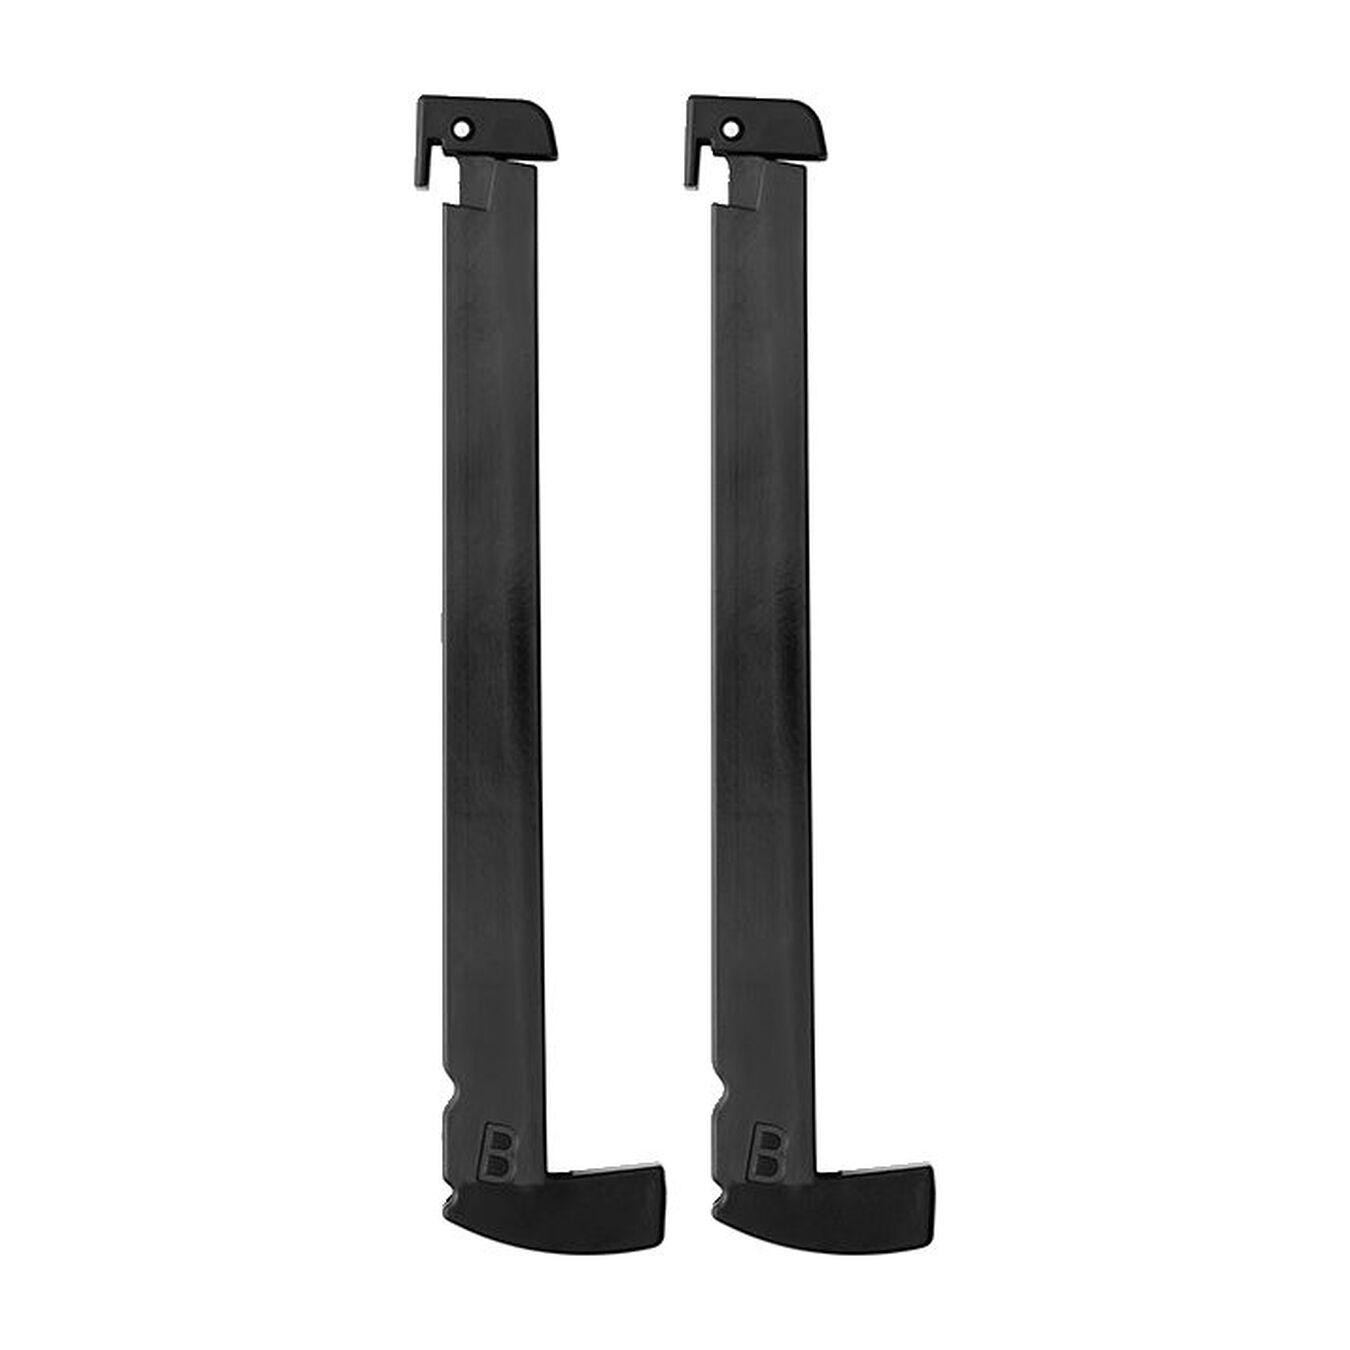 Affilacoltelli - 8 cm, ABS, nero,,large 2